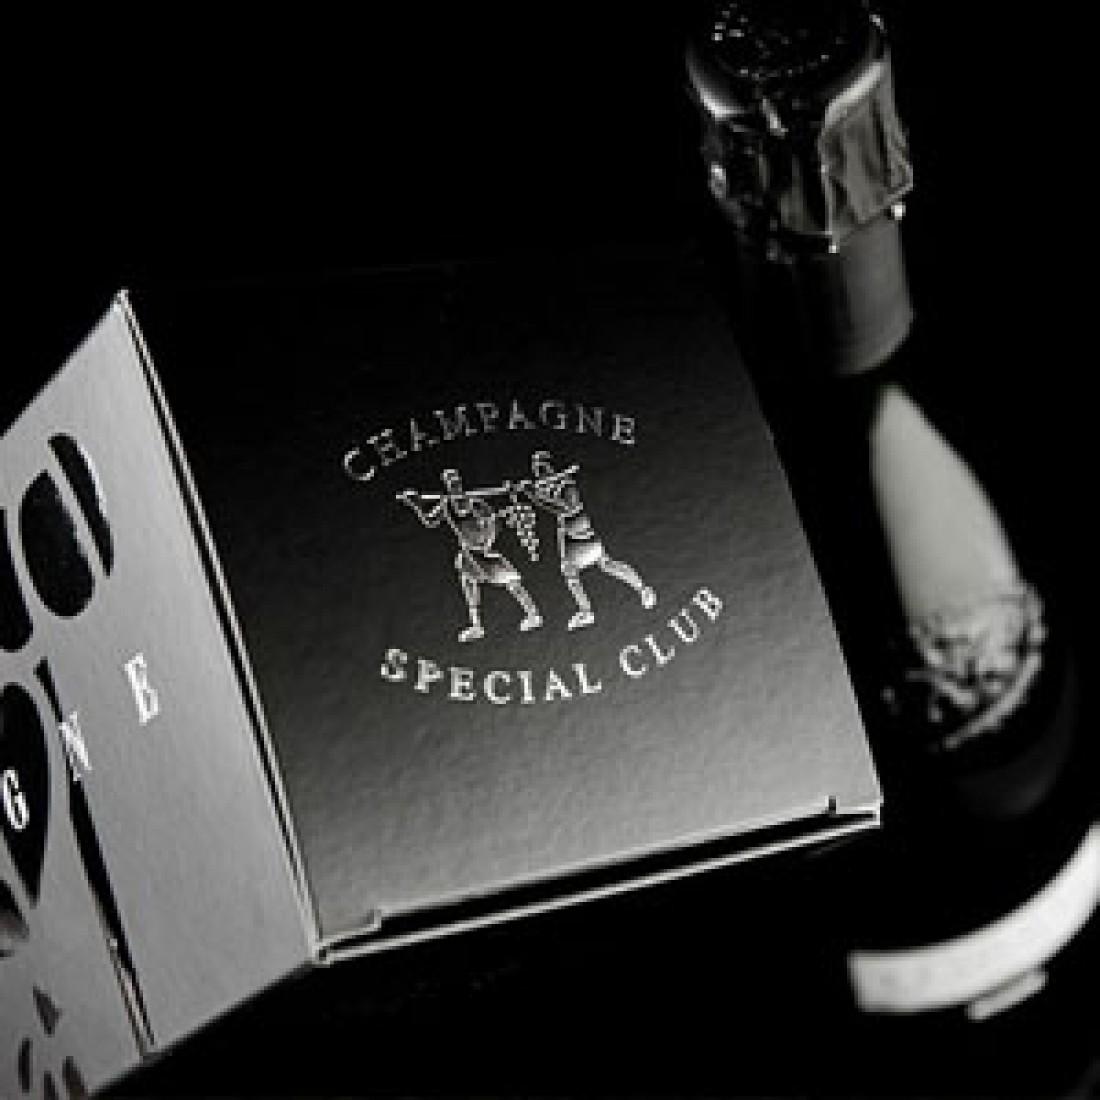 Charlier et Fils Special Club 2008 Magnum-31